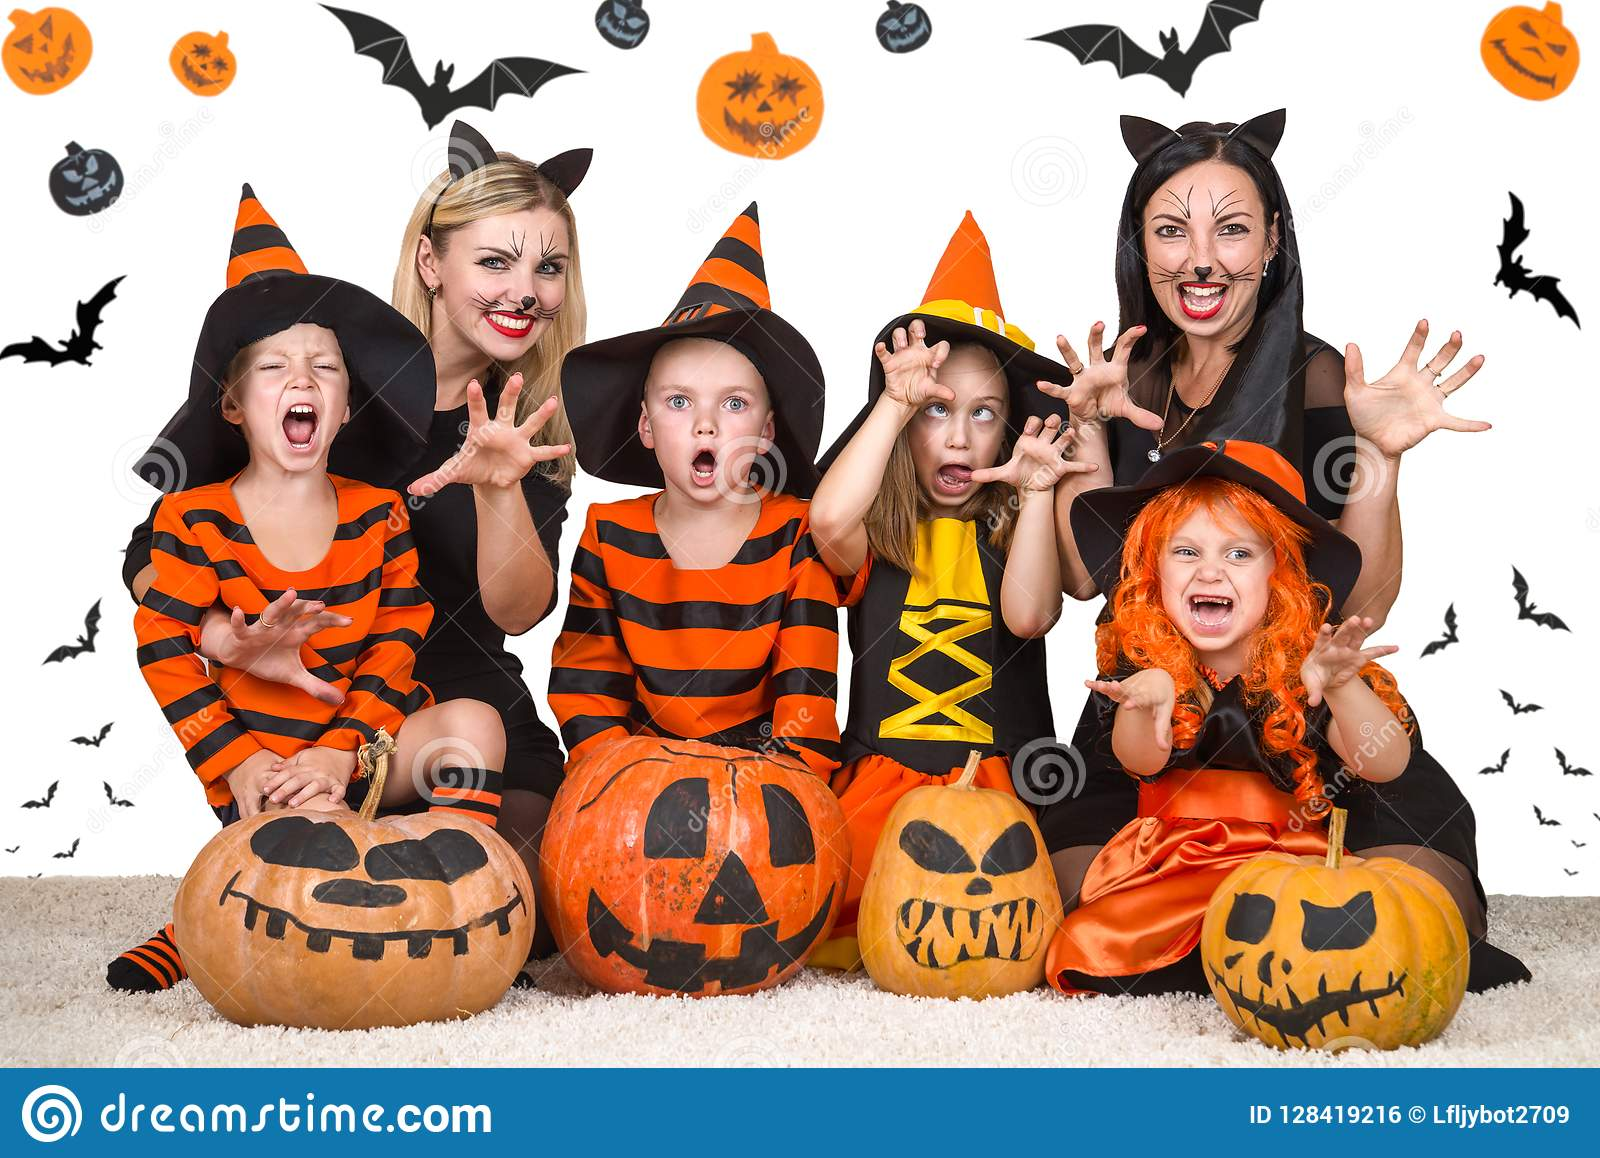 Children with moms celebrating Halloween.